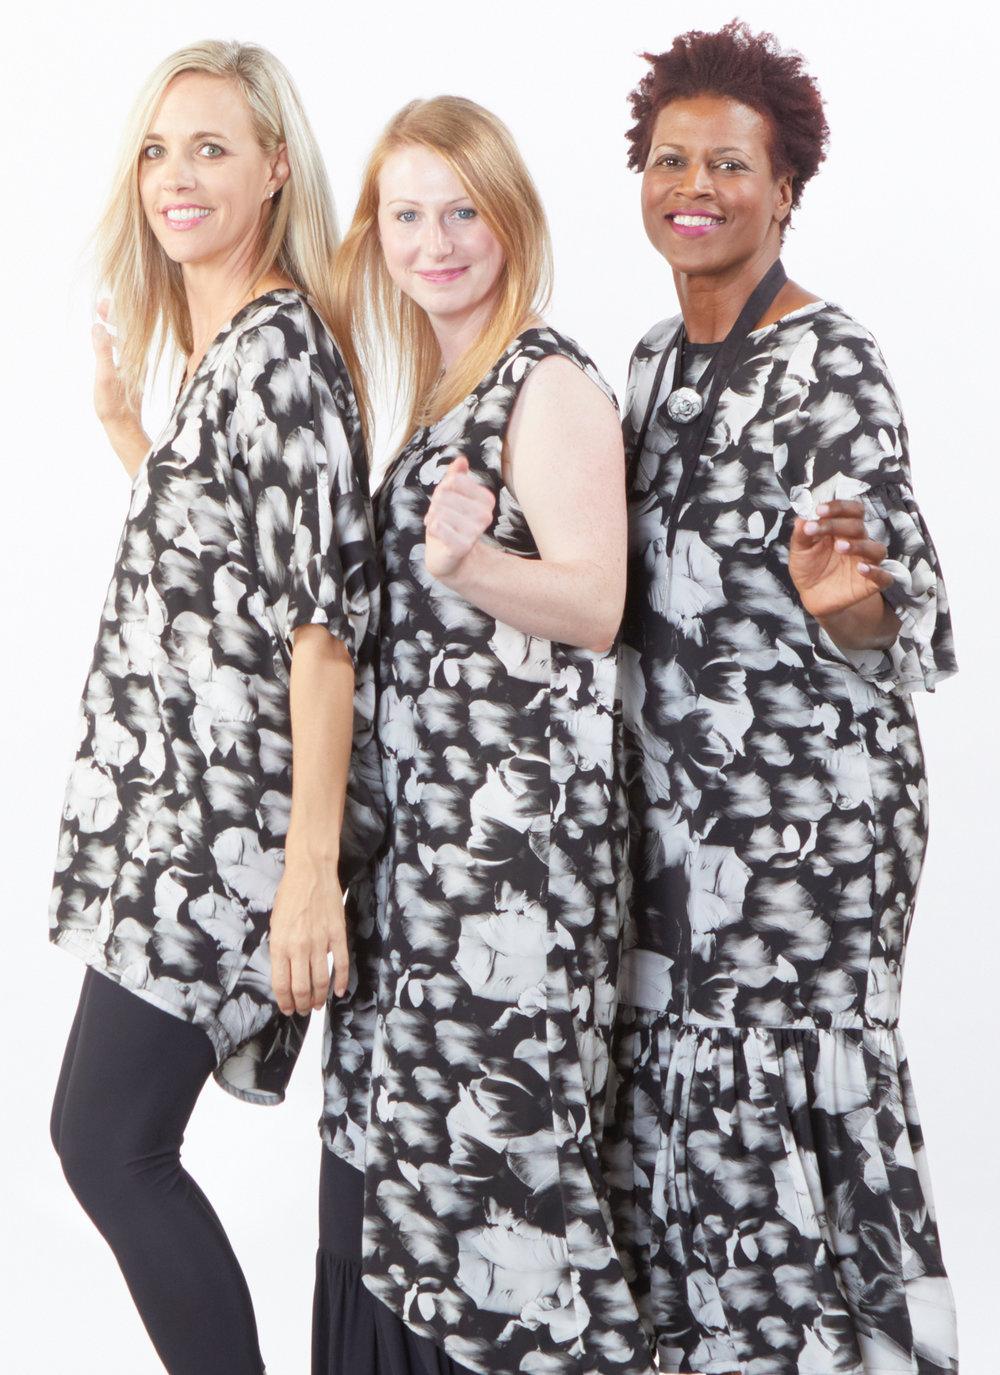 Raquel Tunic, Euna Dress, Seraphina Dress in Black Tulip Print, Legging, Ruffle Pant in Black Microfiber Jersey